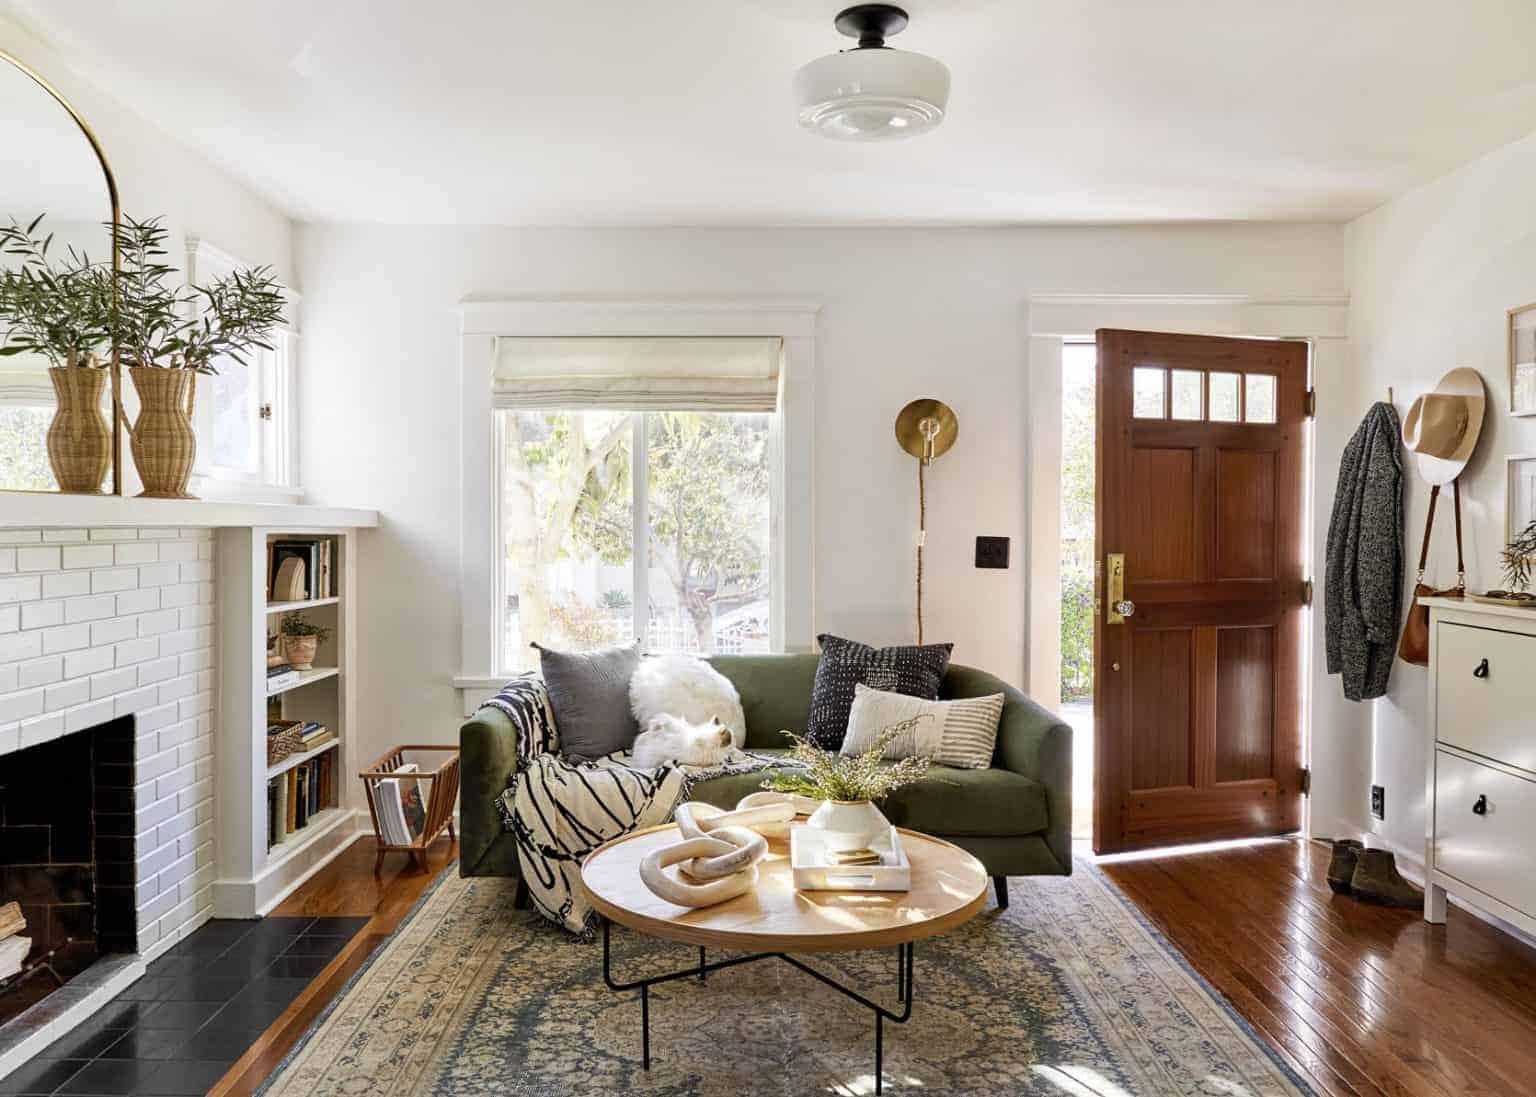 Sara Tramp Living Room Dining Room TV Room LoRes 1 1536x1097 1